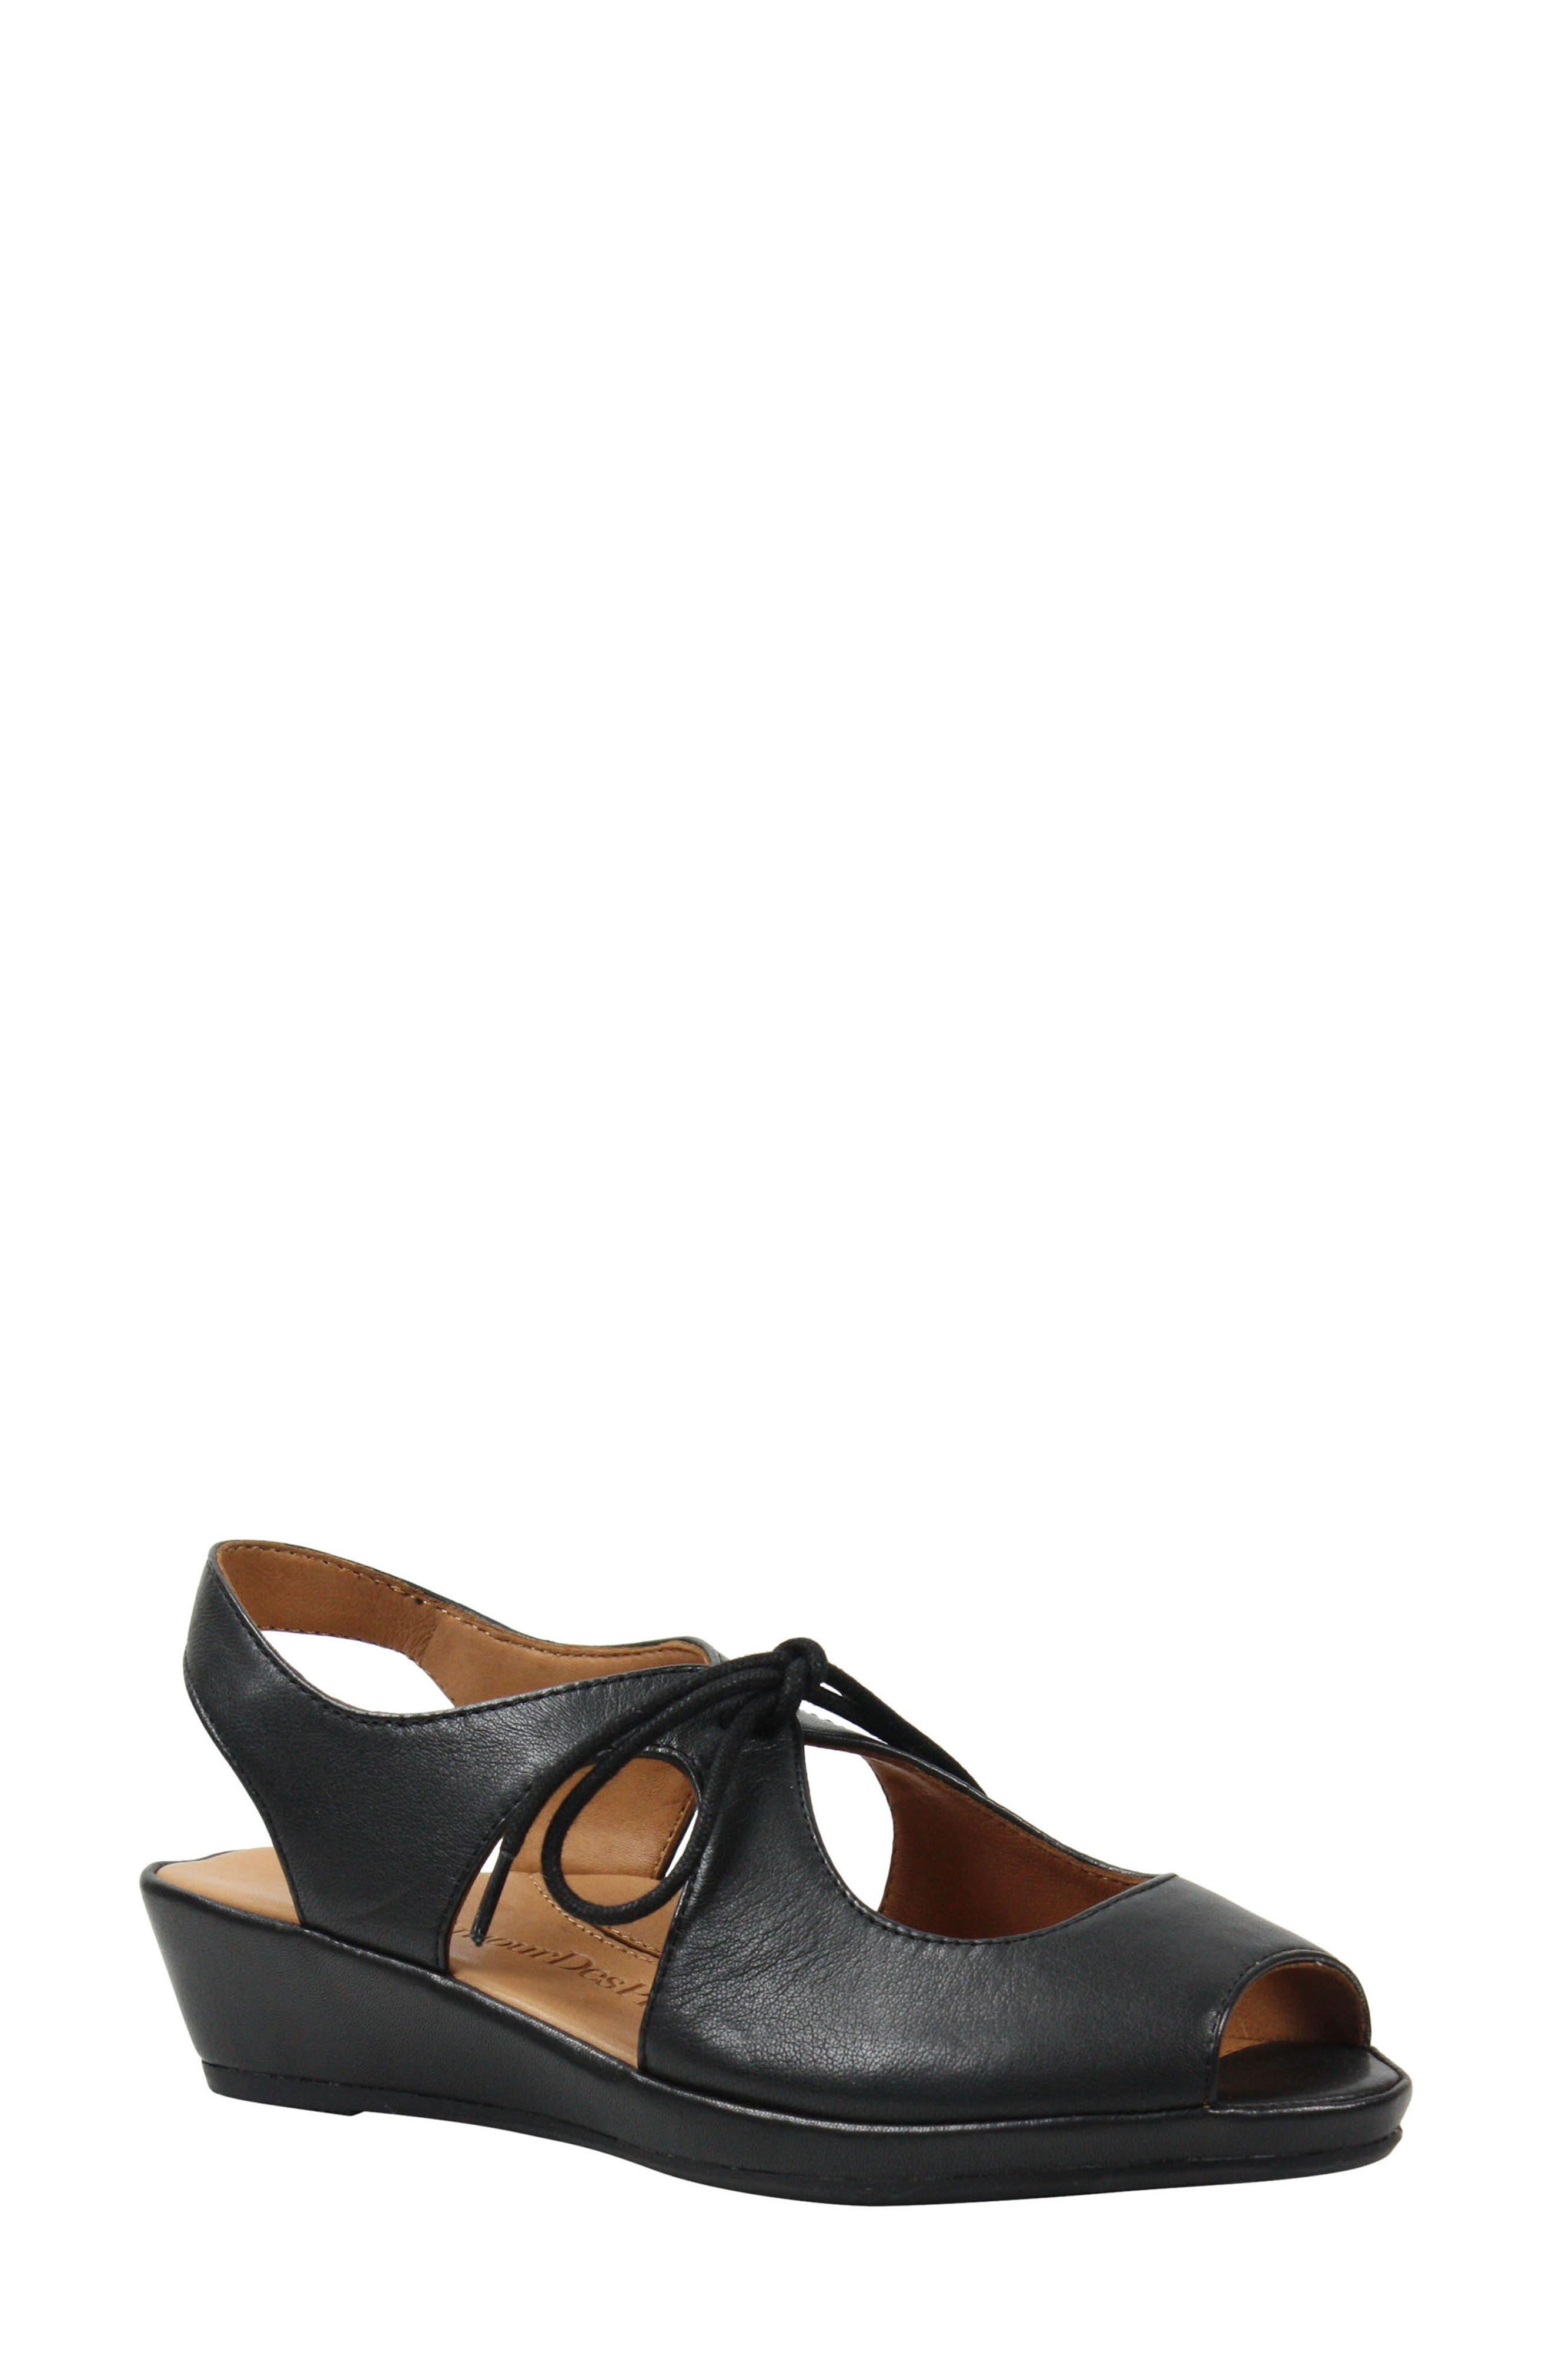 Brettany Sandal,                         Main,                         color, Black Leather